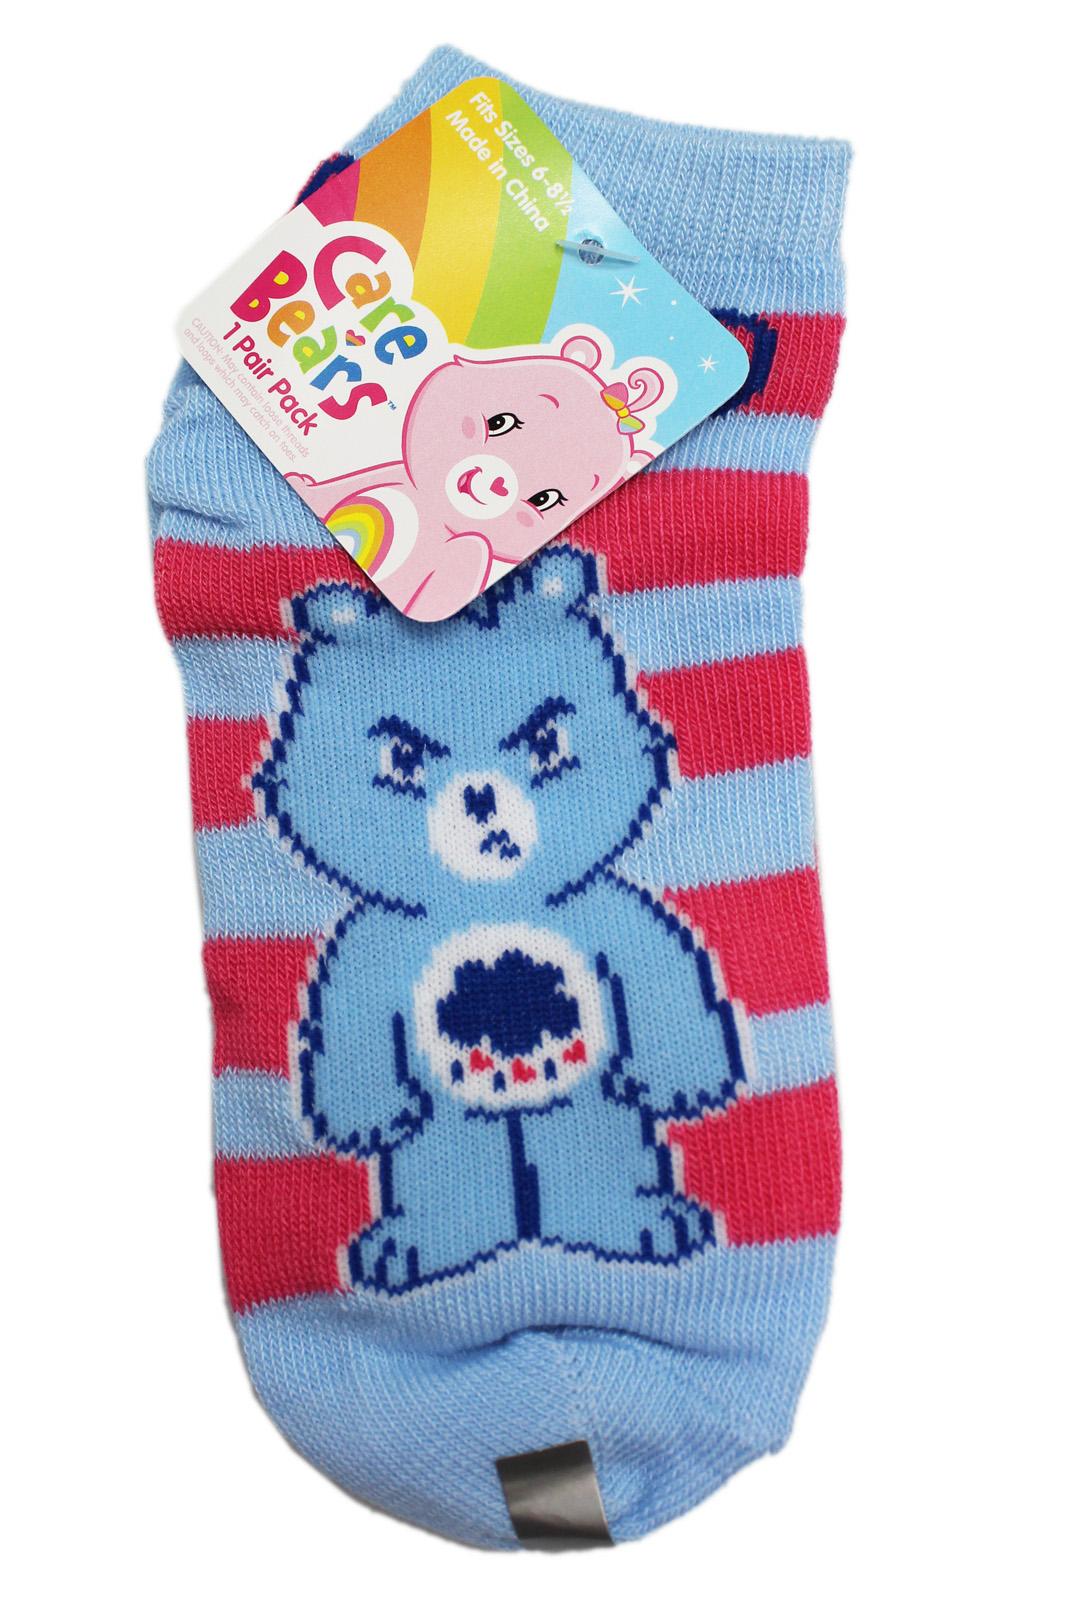 1 Pair, Size 6-8 Strawberry Shortcake Green Striped White Kids Socks